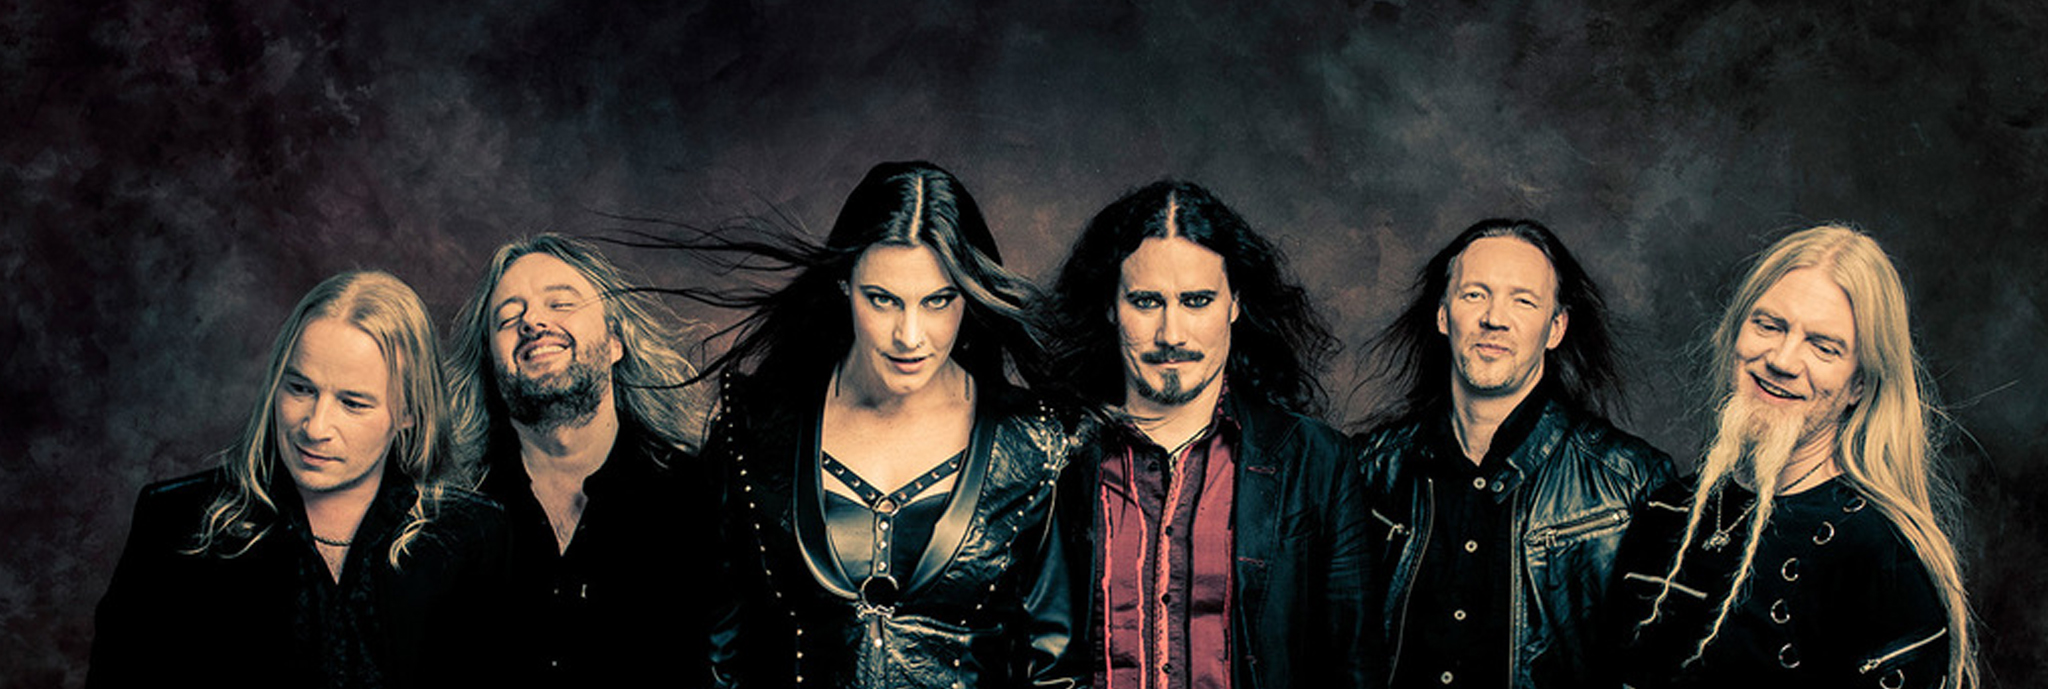 Nightwish in der König-Pilsener-ARENA